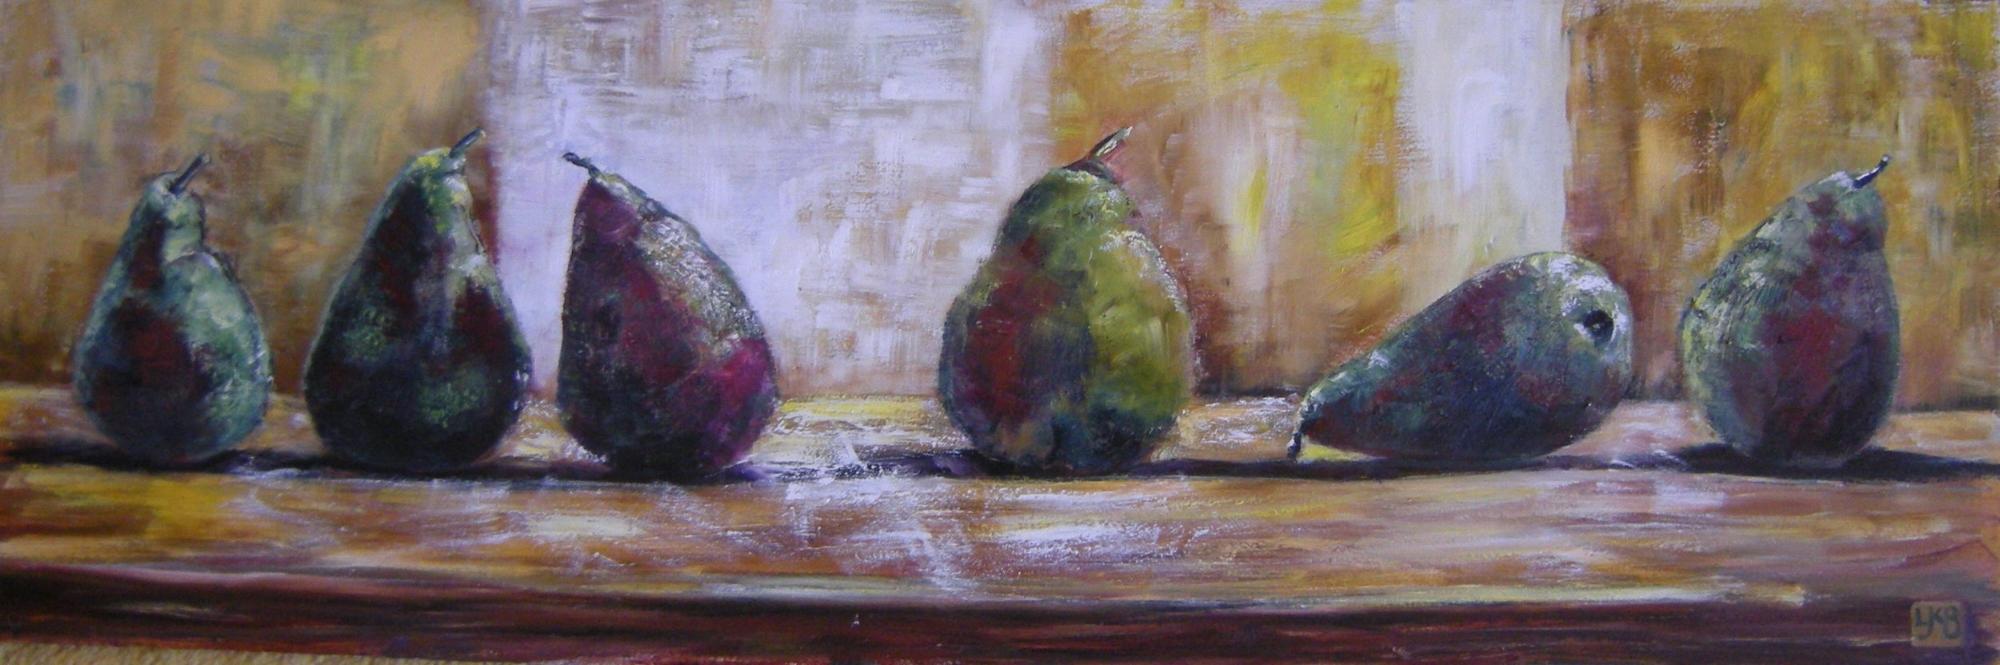 Linda Kinsman Blake, Oil, Pears